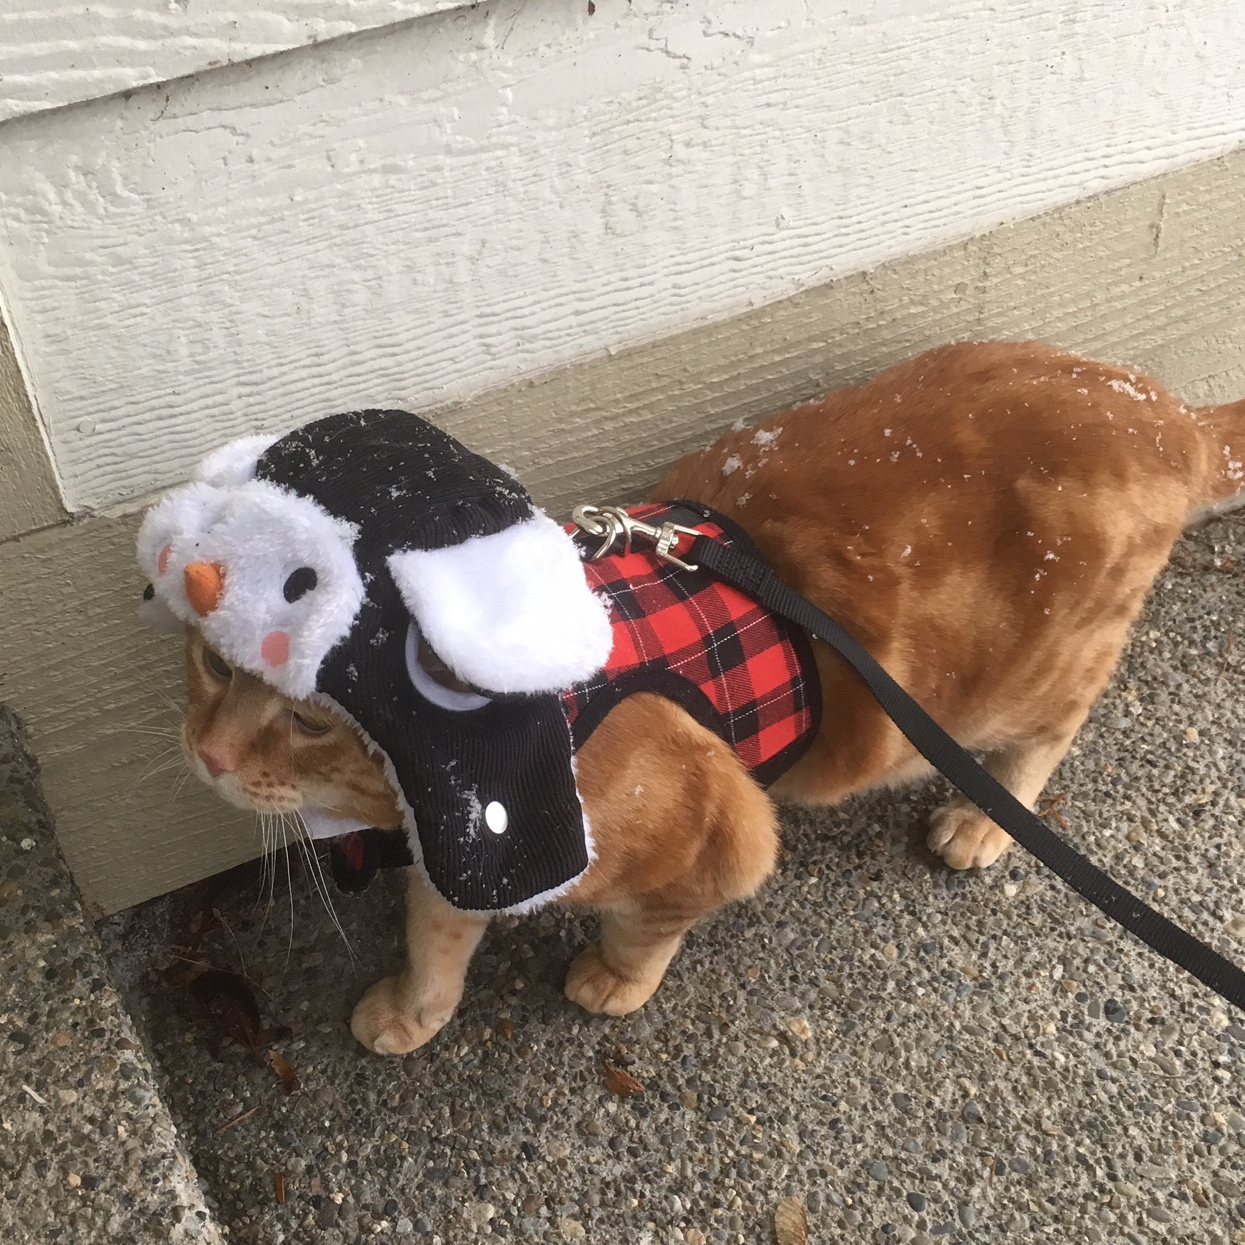 Scooby cat